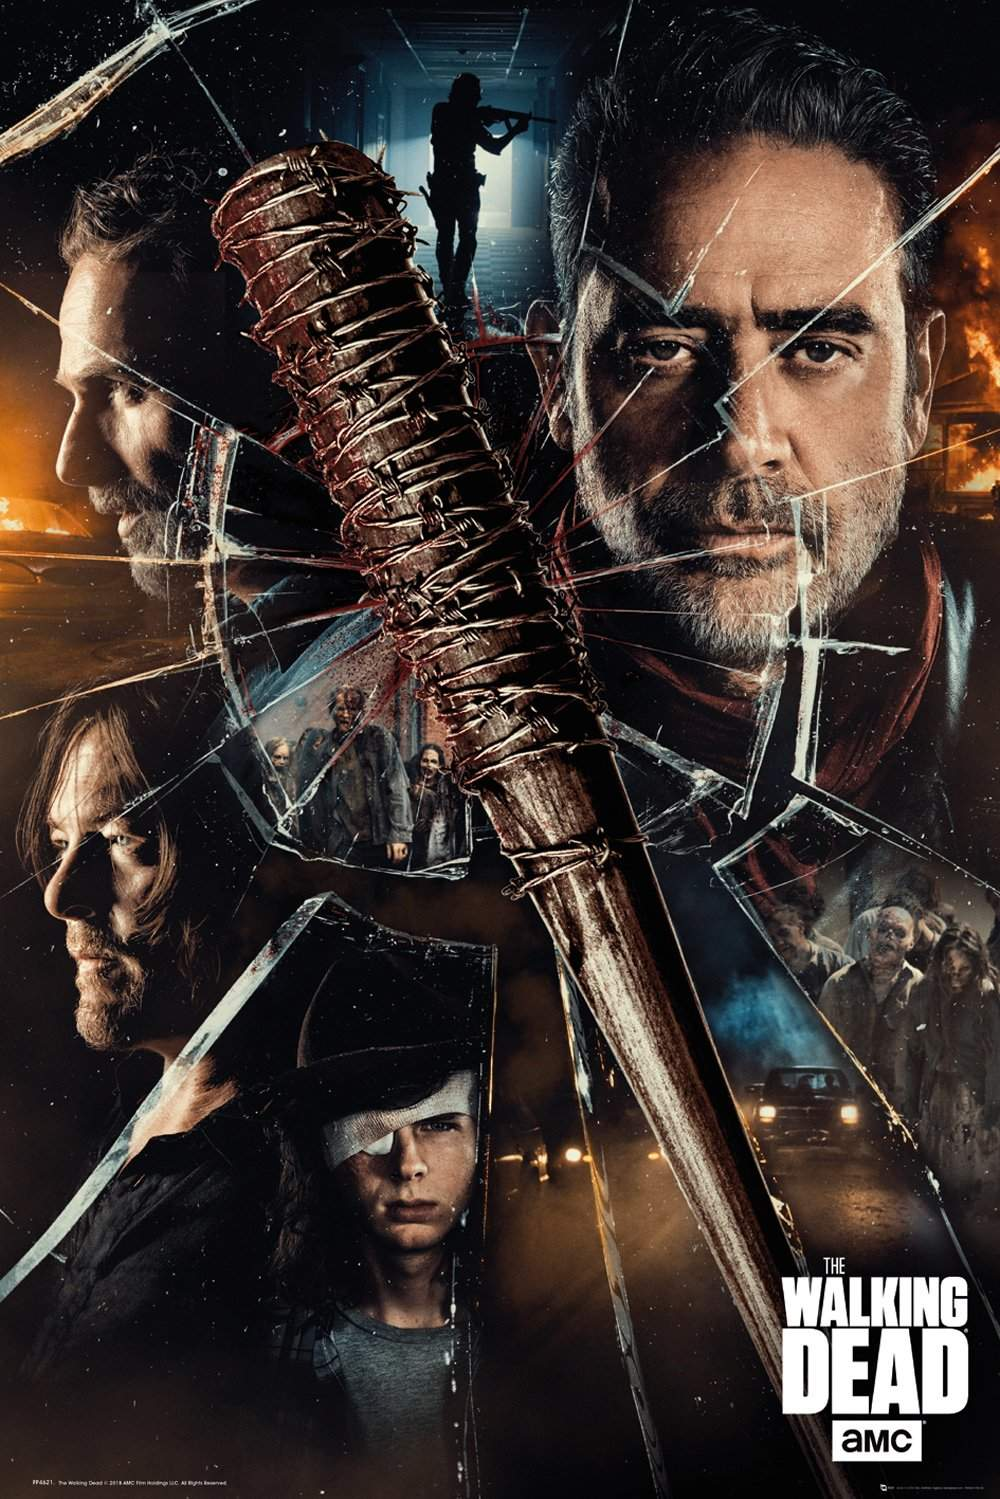 The Walking Dead - Smash